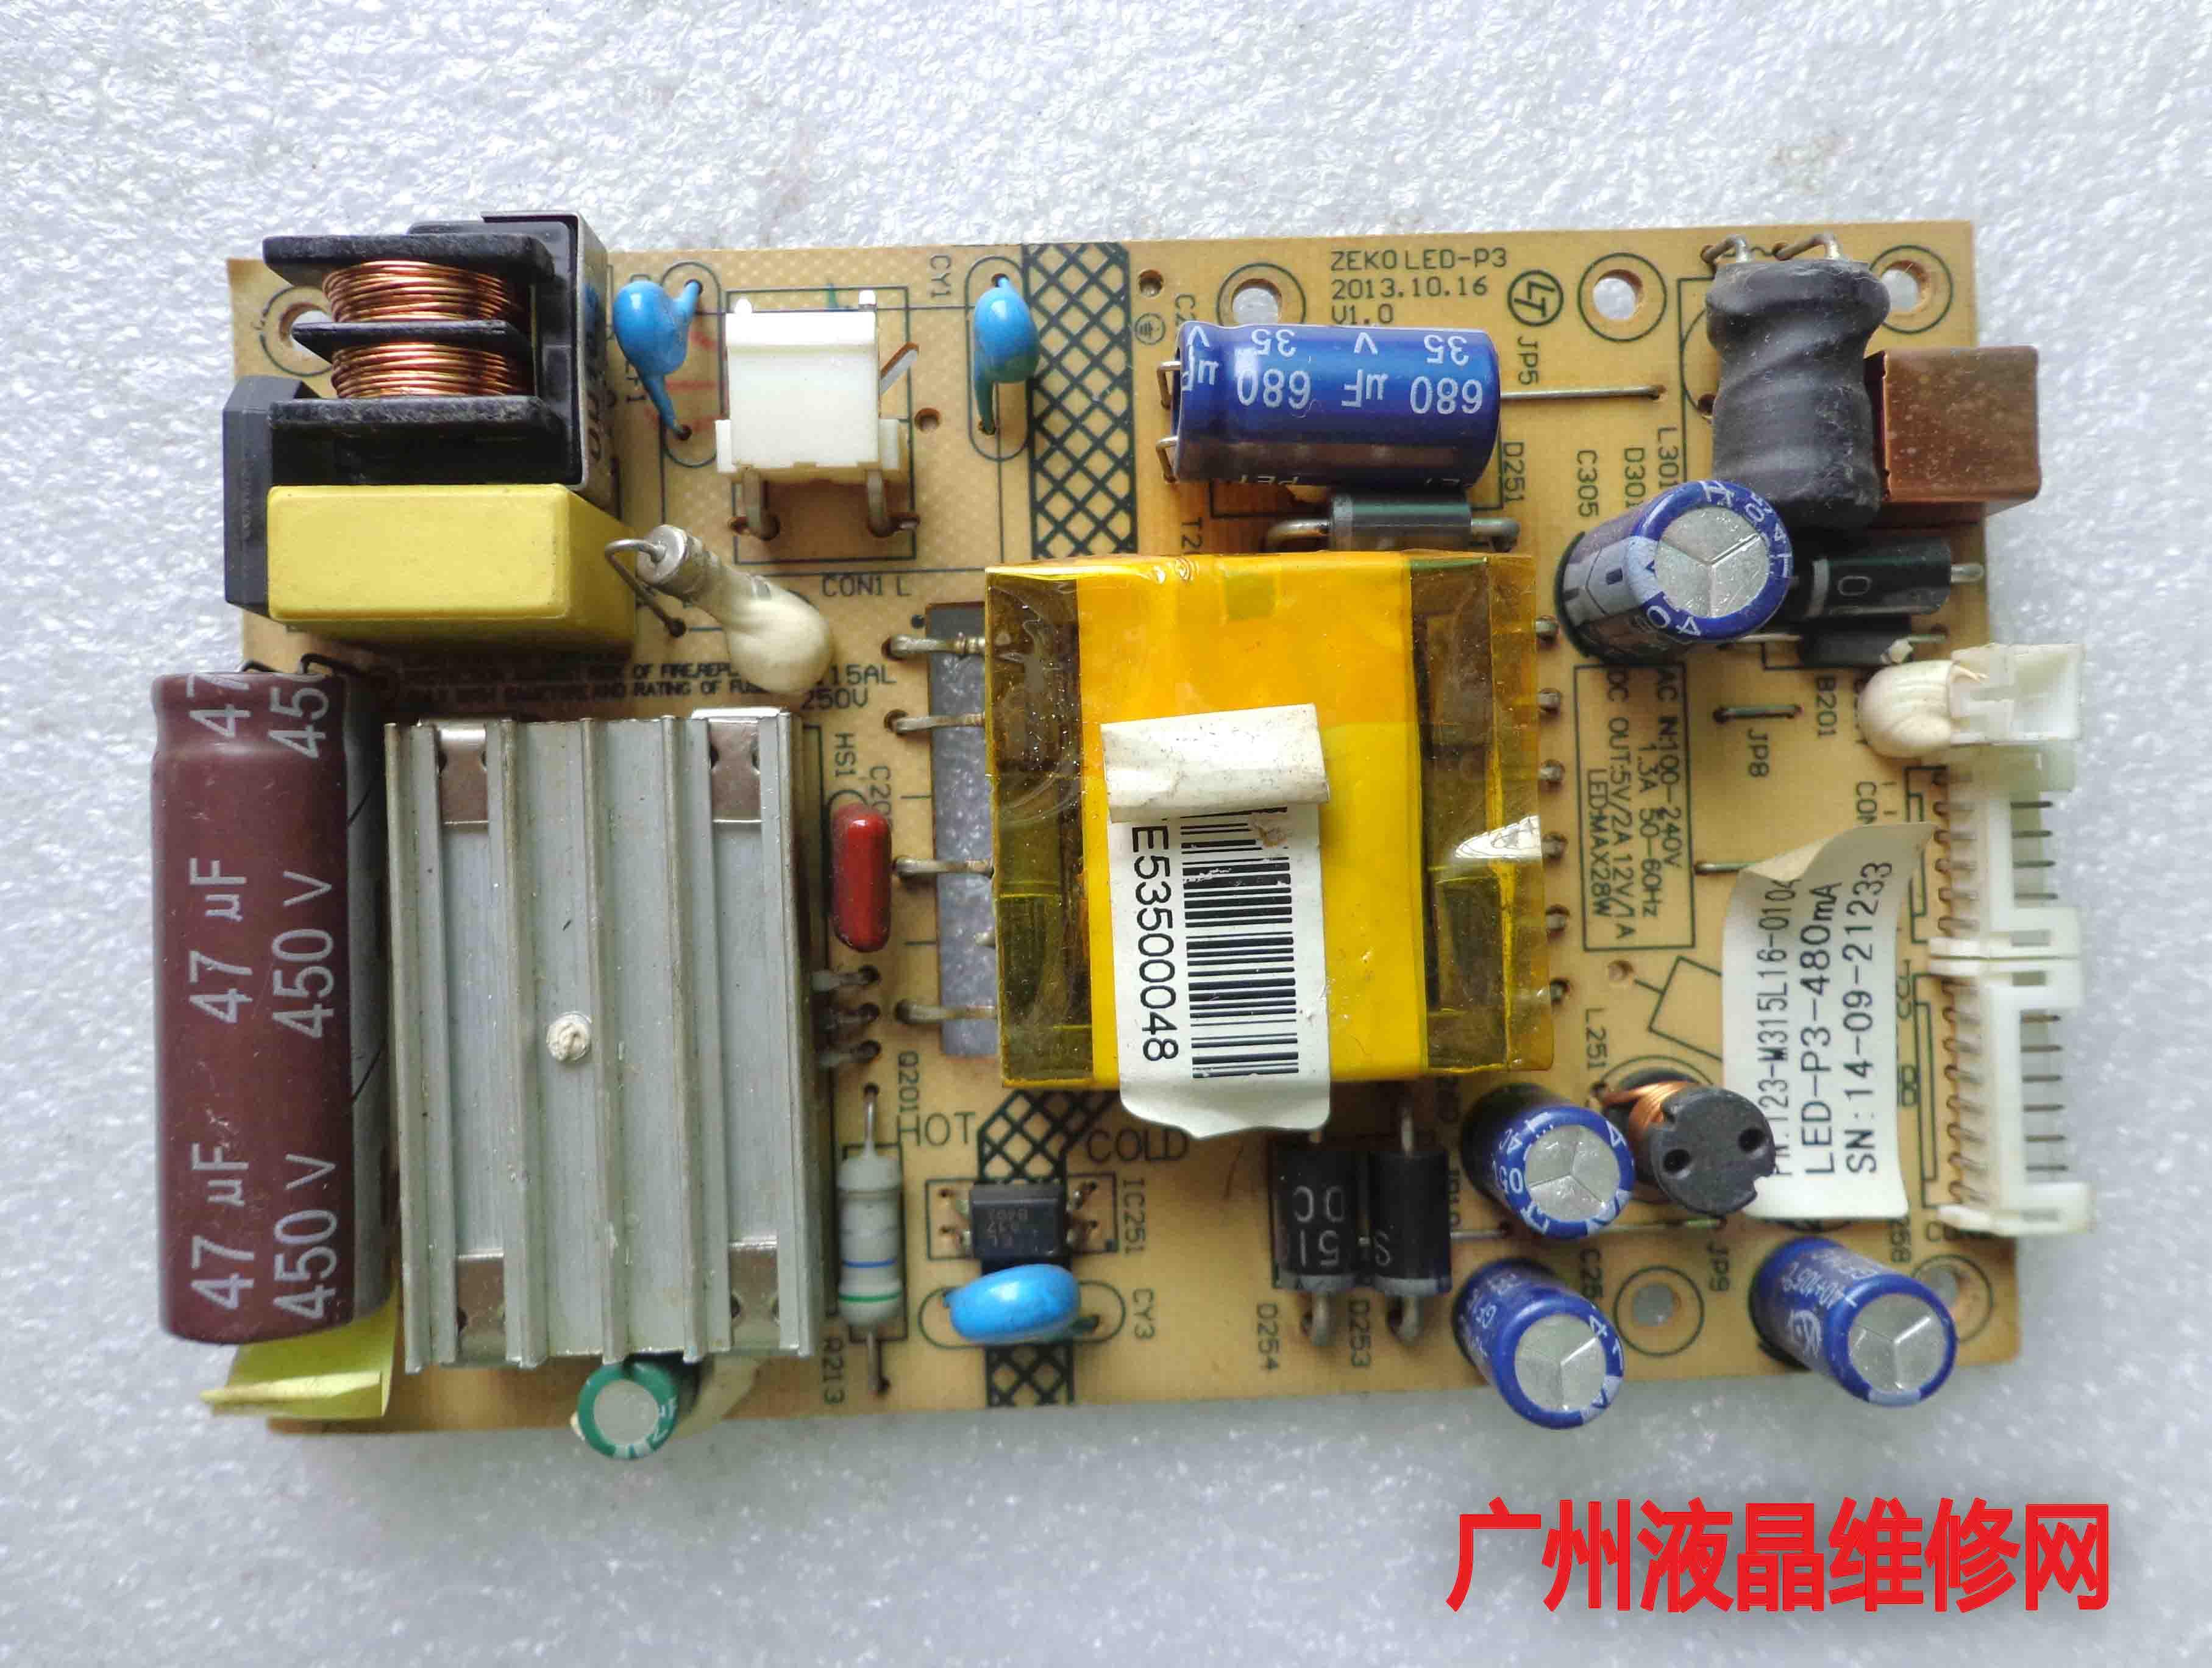 ML326S LZ2832B placa de potencia ZEK0LED-P3 ZEK0 placa base